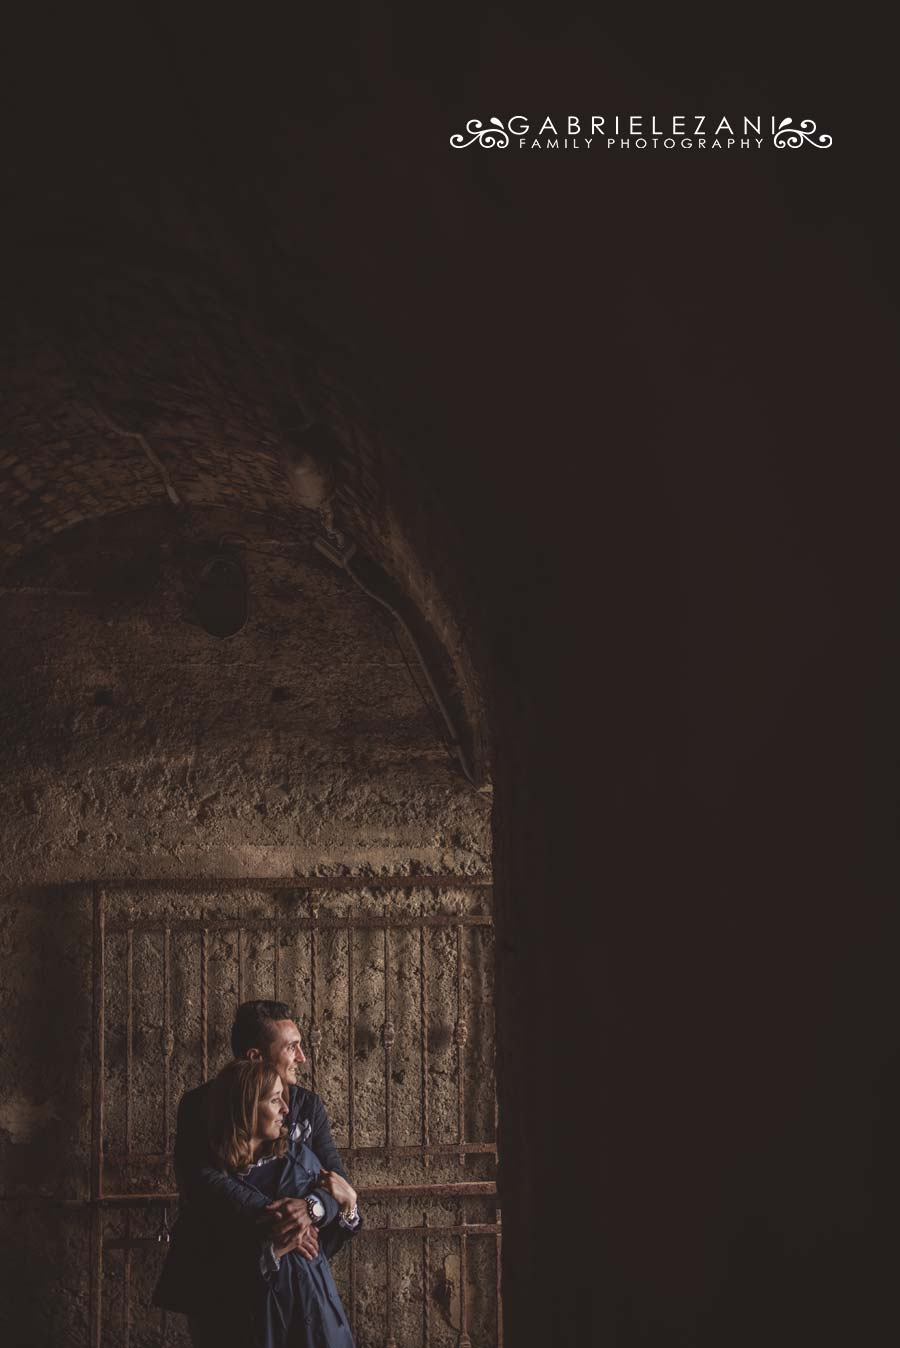 foto prematrimoniale lerici gabriele zani luci ombre